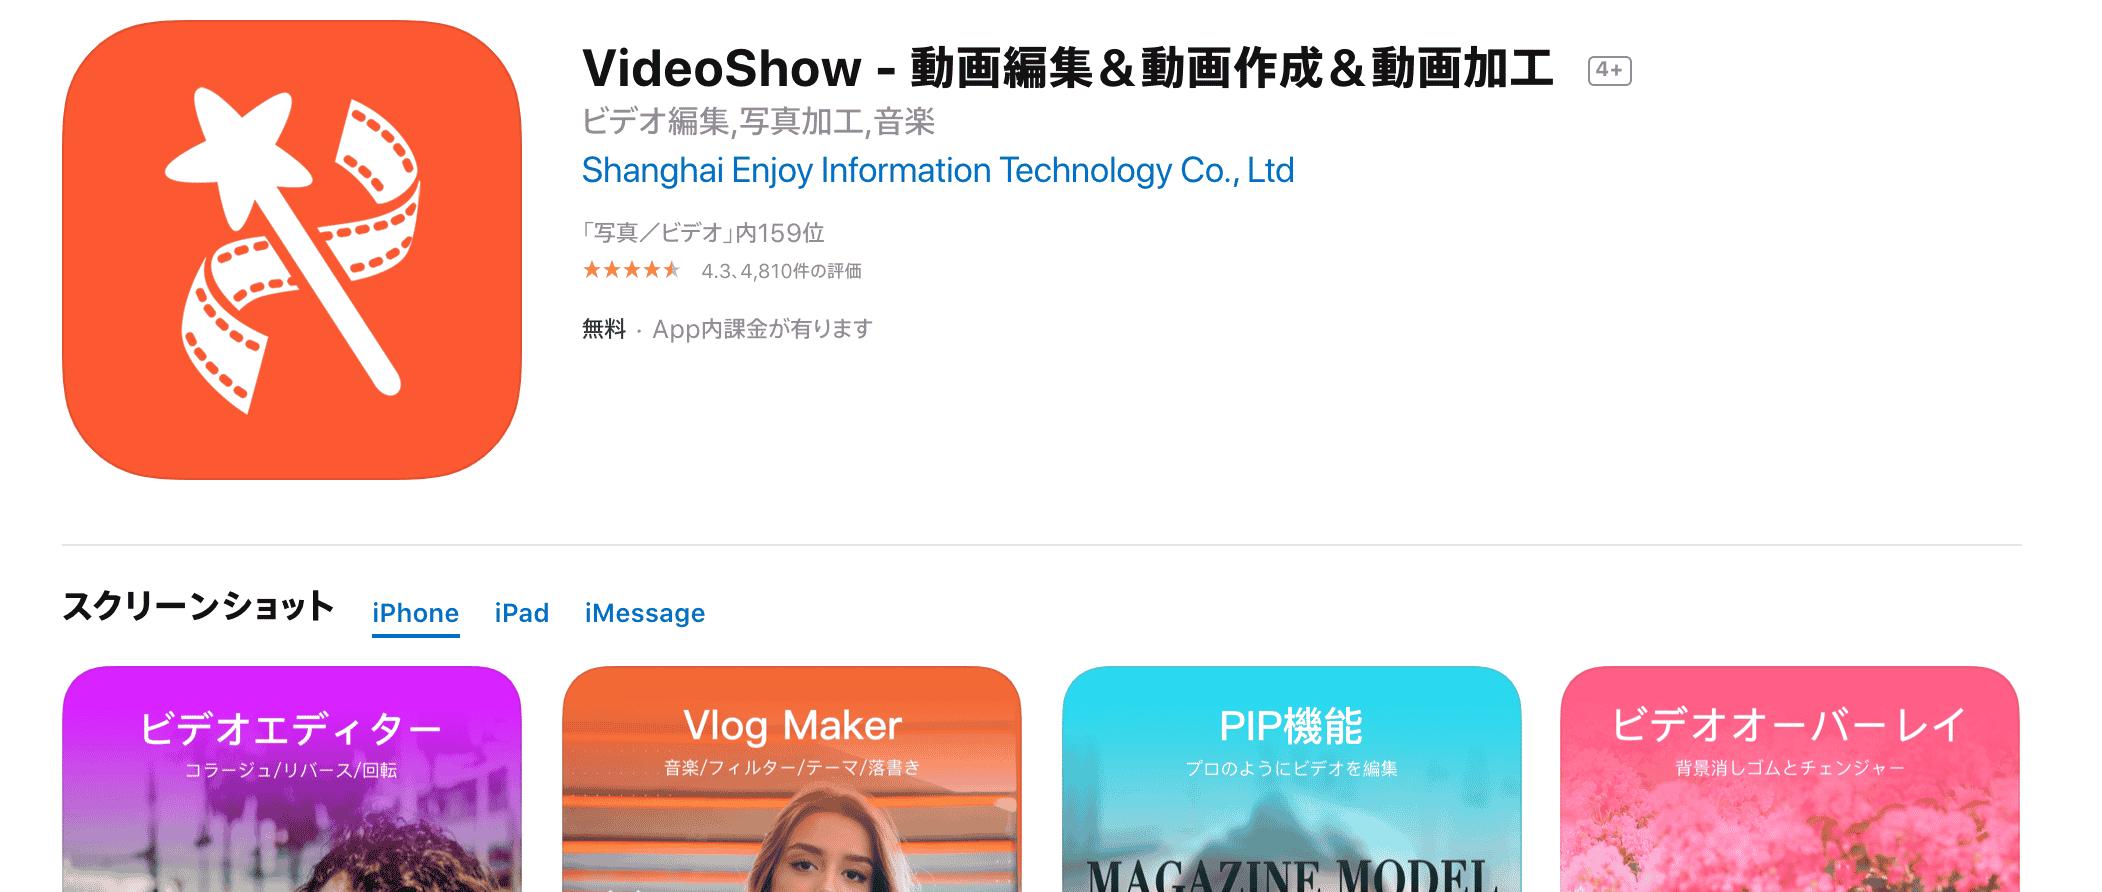 iPhoneで動画が編集できる人気アプリ④「VideoShow」